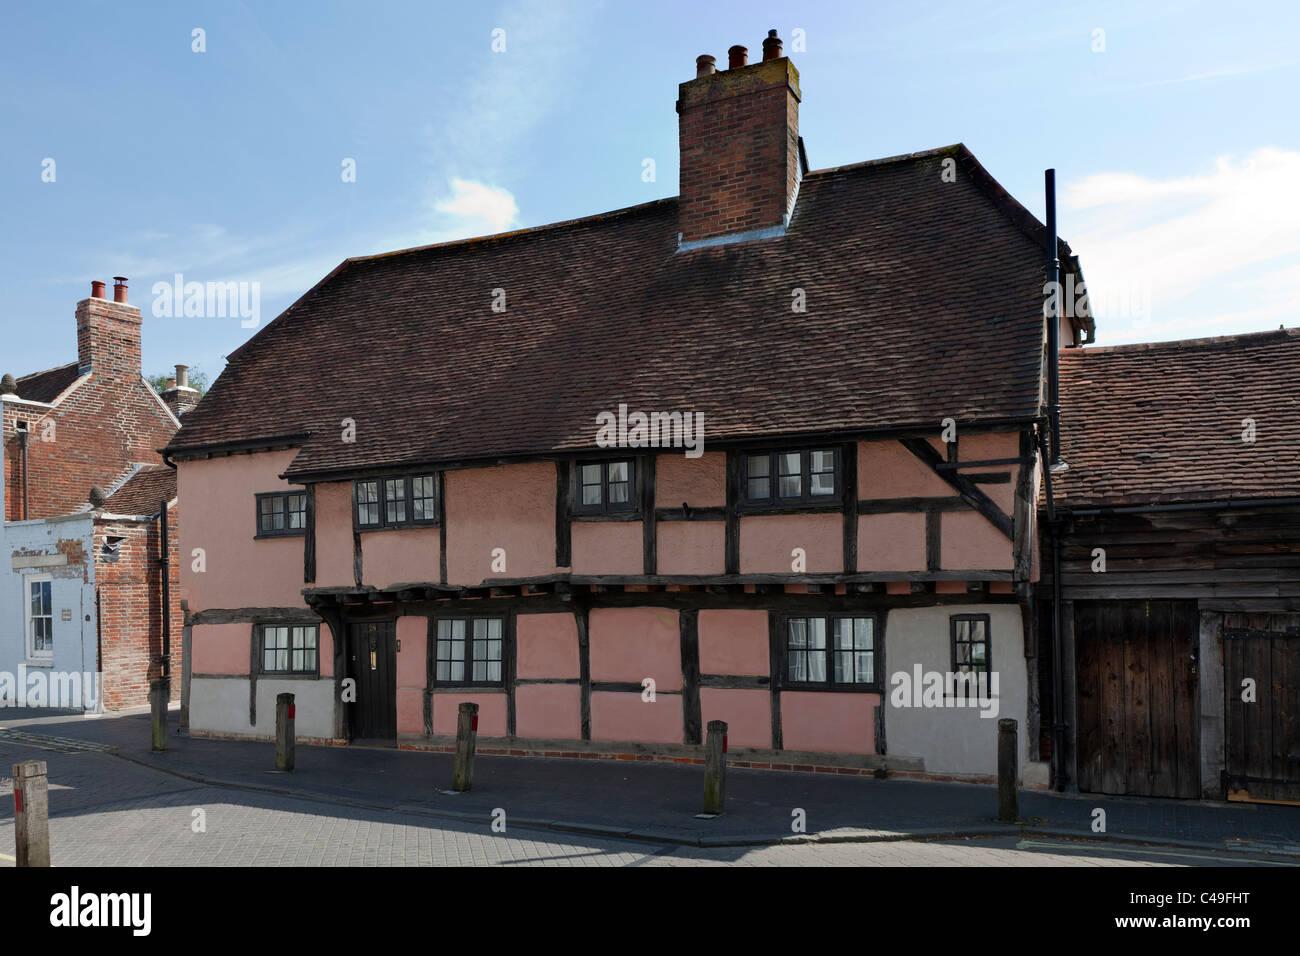 Altbau Wohnung Titchfield Hampshire England UK High Street Holz Rahmen Holz Holz rosa verwitterte Eiche Garagentor Stockbild